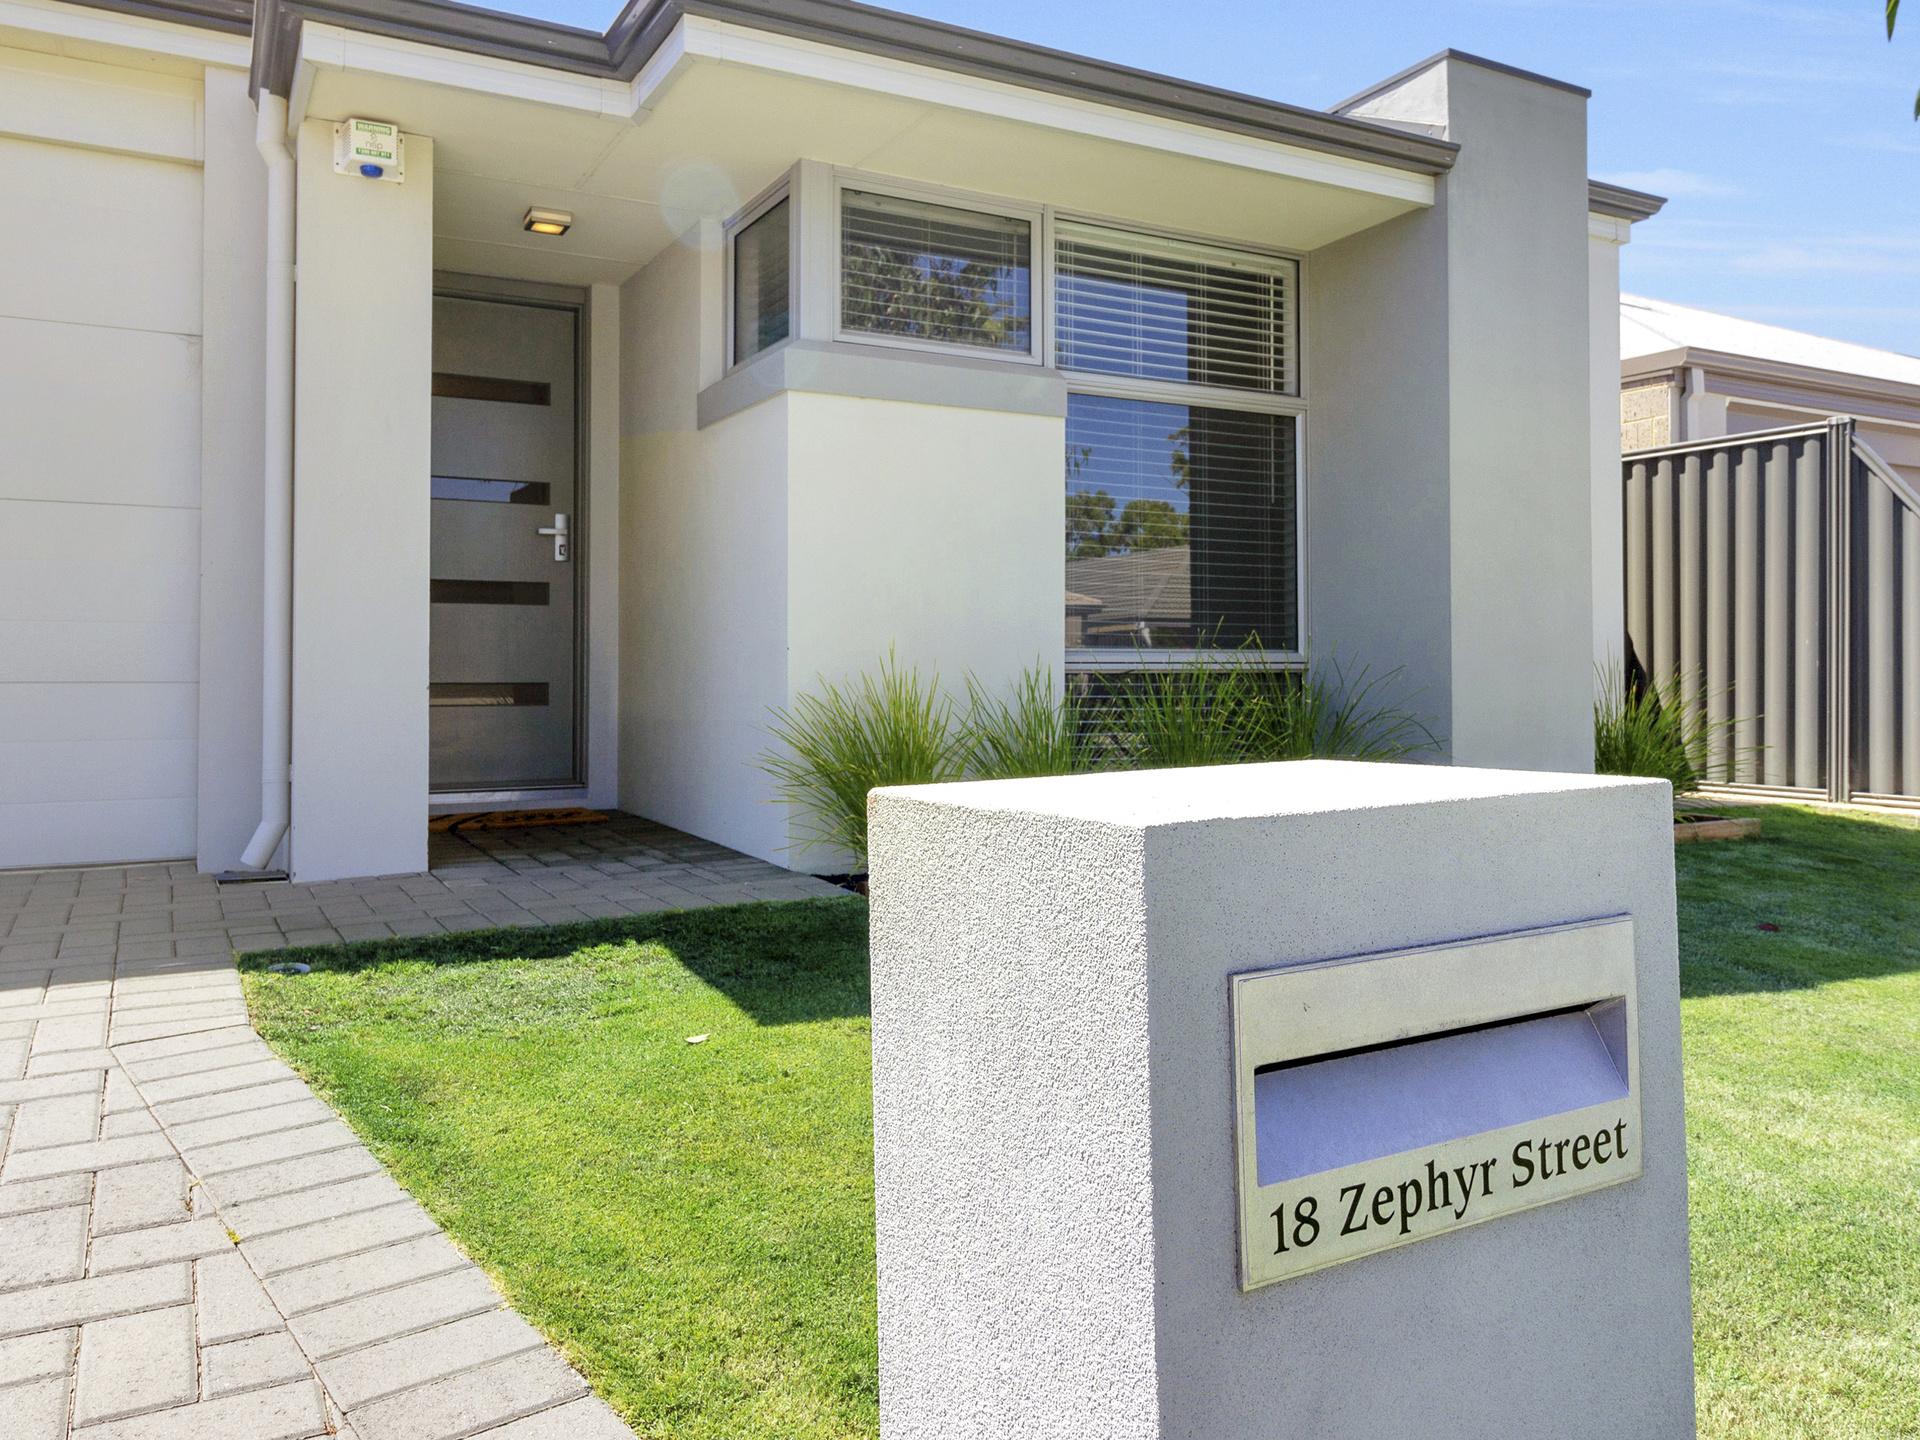 18 Zephyr Street